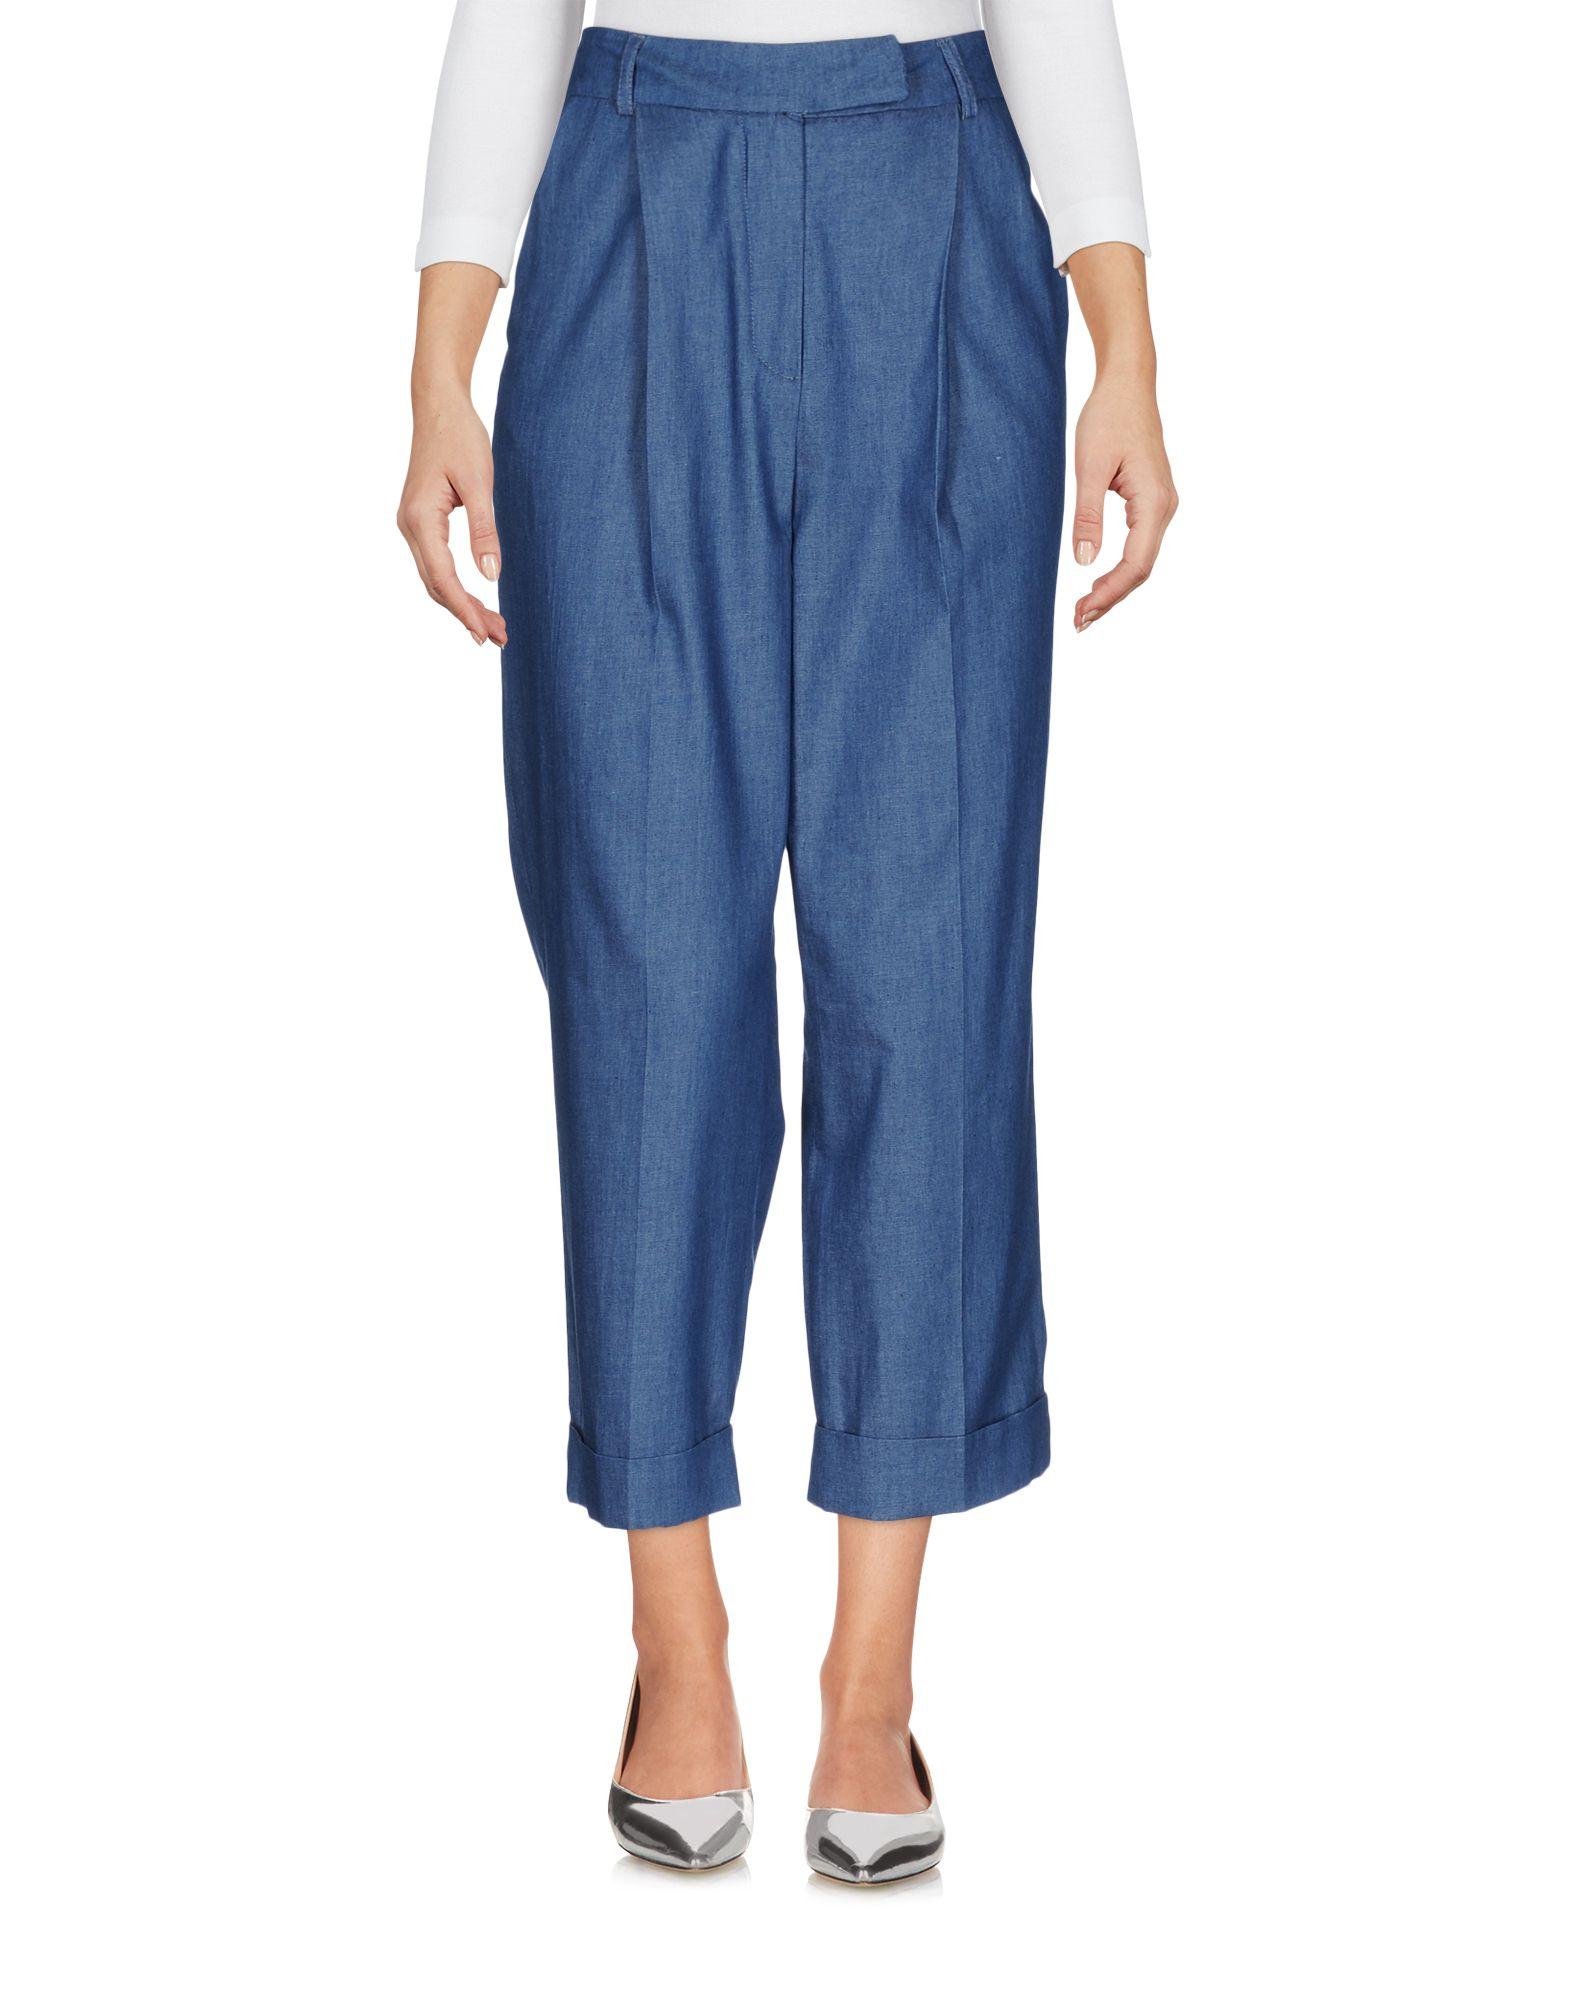 VAPOFORNO MILANO Джинсовые брюки vapoforno milano повседневные брюки